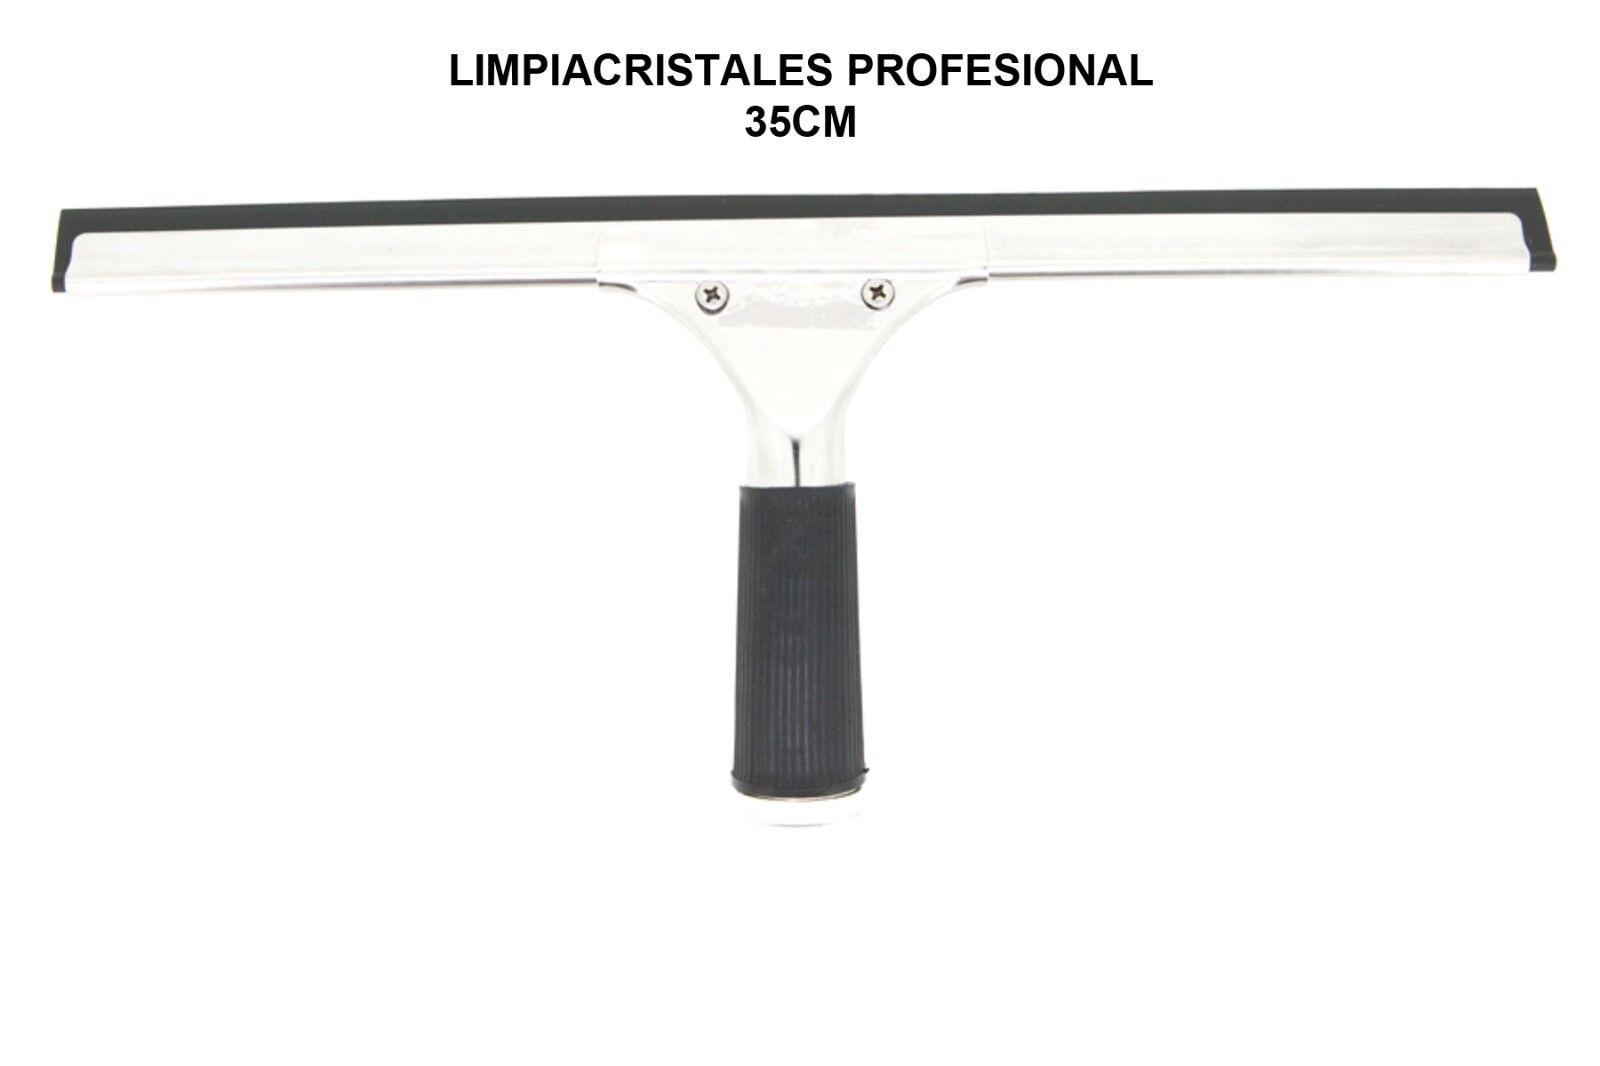 Regleta raqueta limpia vidrios - lunas - cristales profesional con soporte 35...